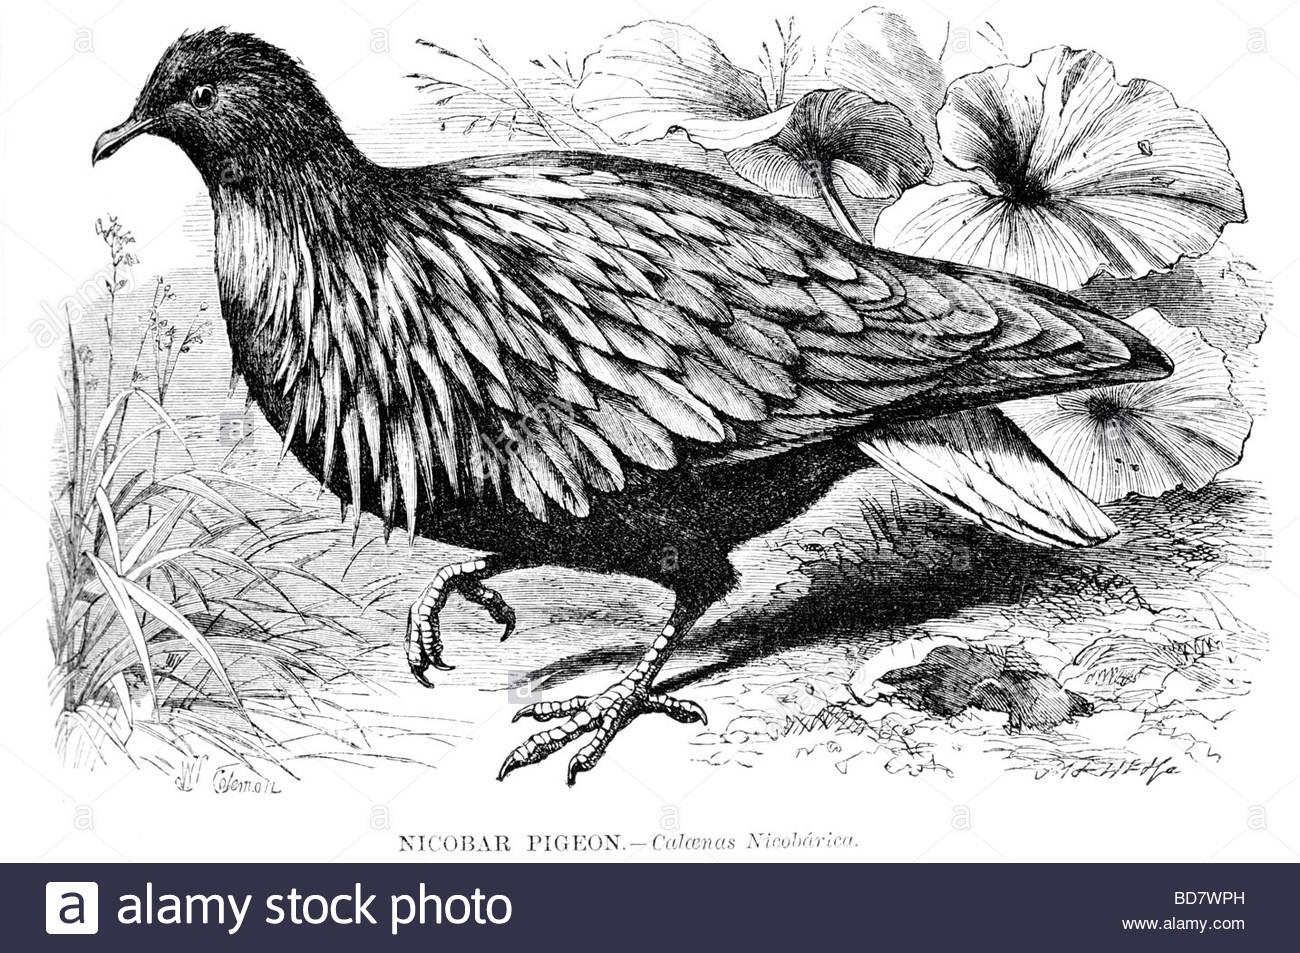 Nicobar Pigeon coloring #11, Download drawings